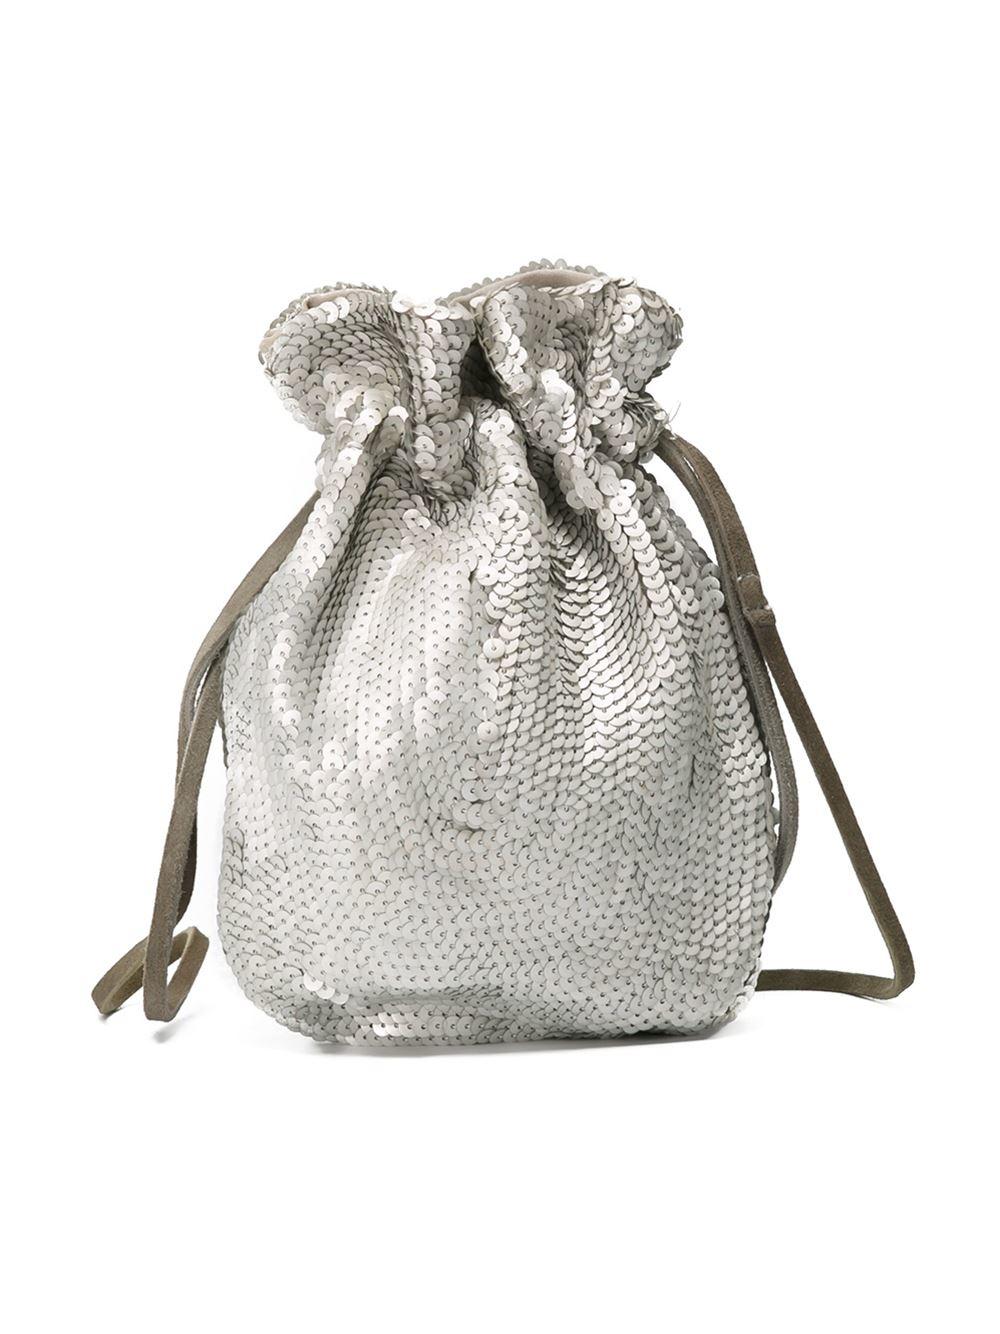 Lyst - Prada Sequin Drawstring Bag in Metallic 720dbdf37dcba